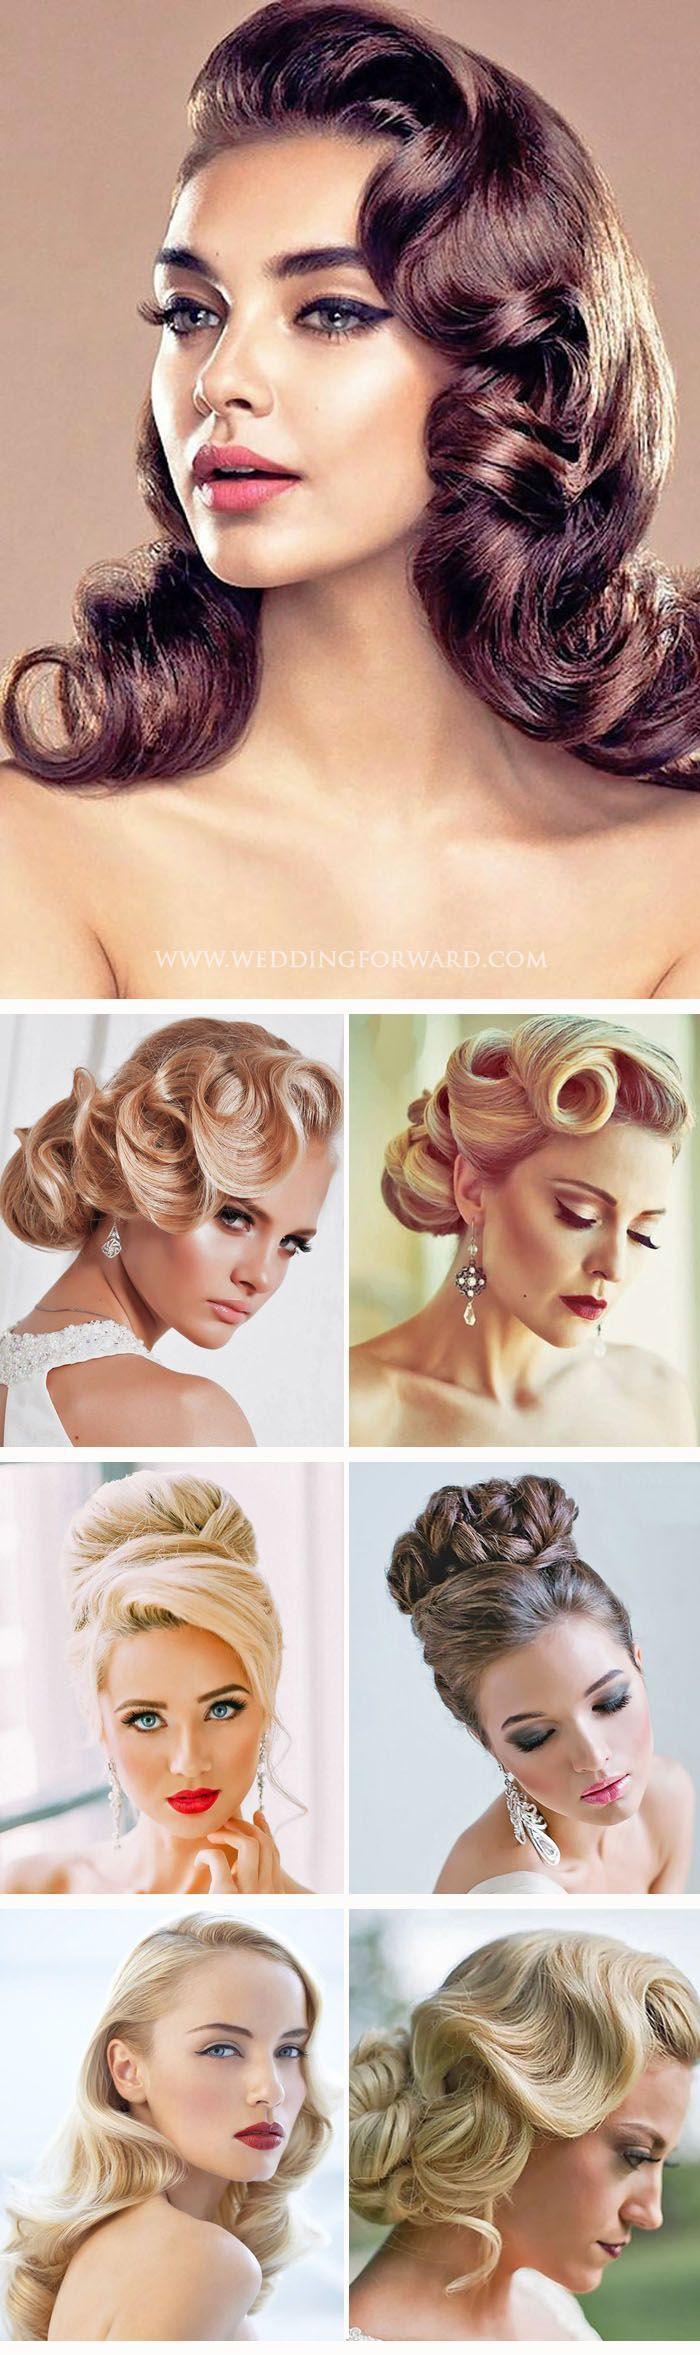 cute u romantic hairstyle ideas for wedding vintage wedding